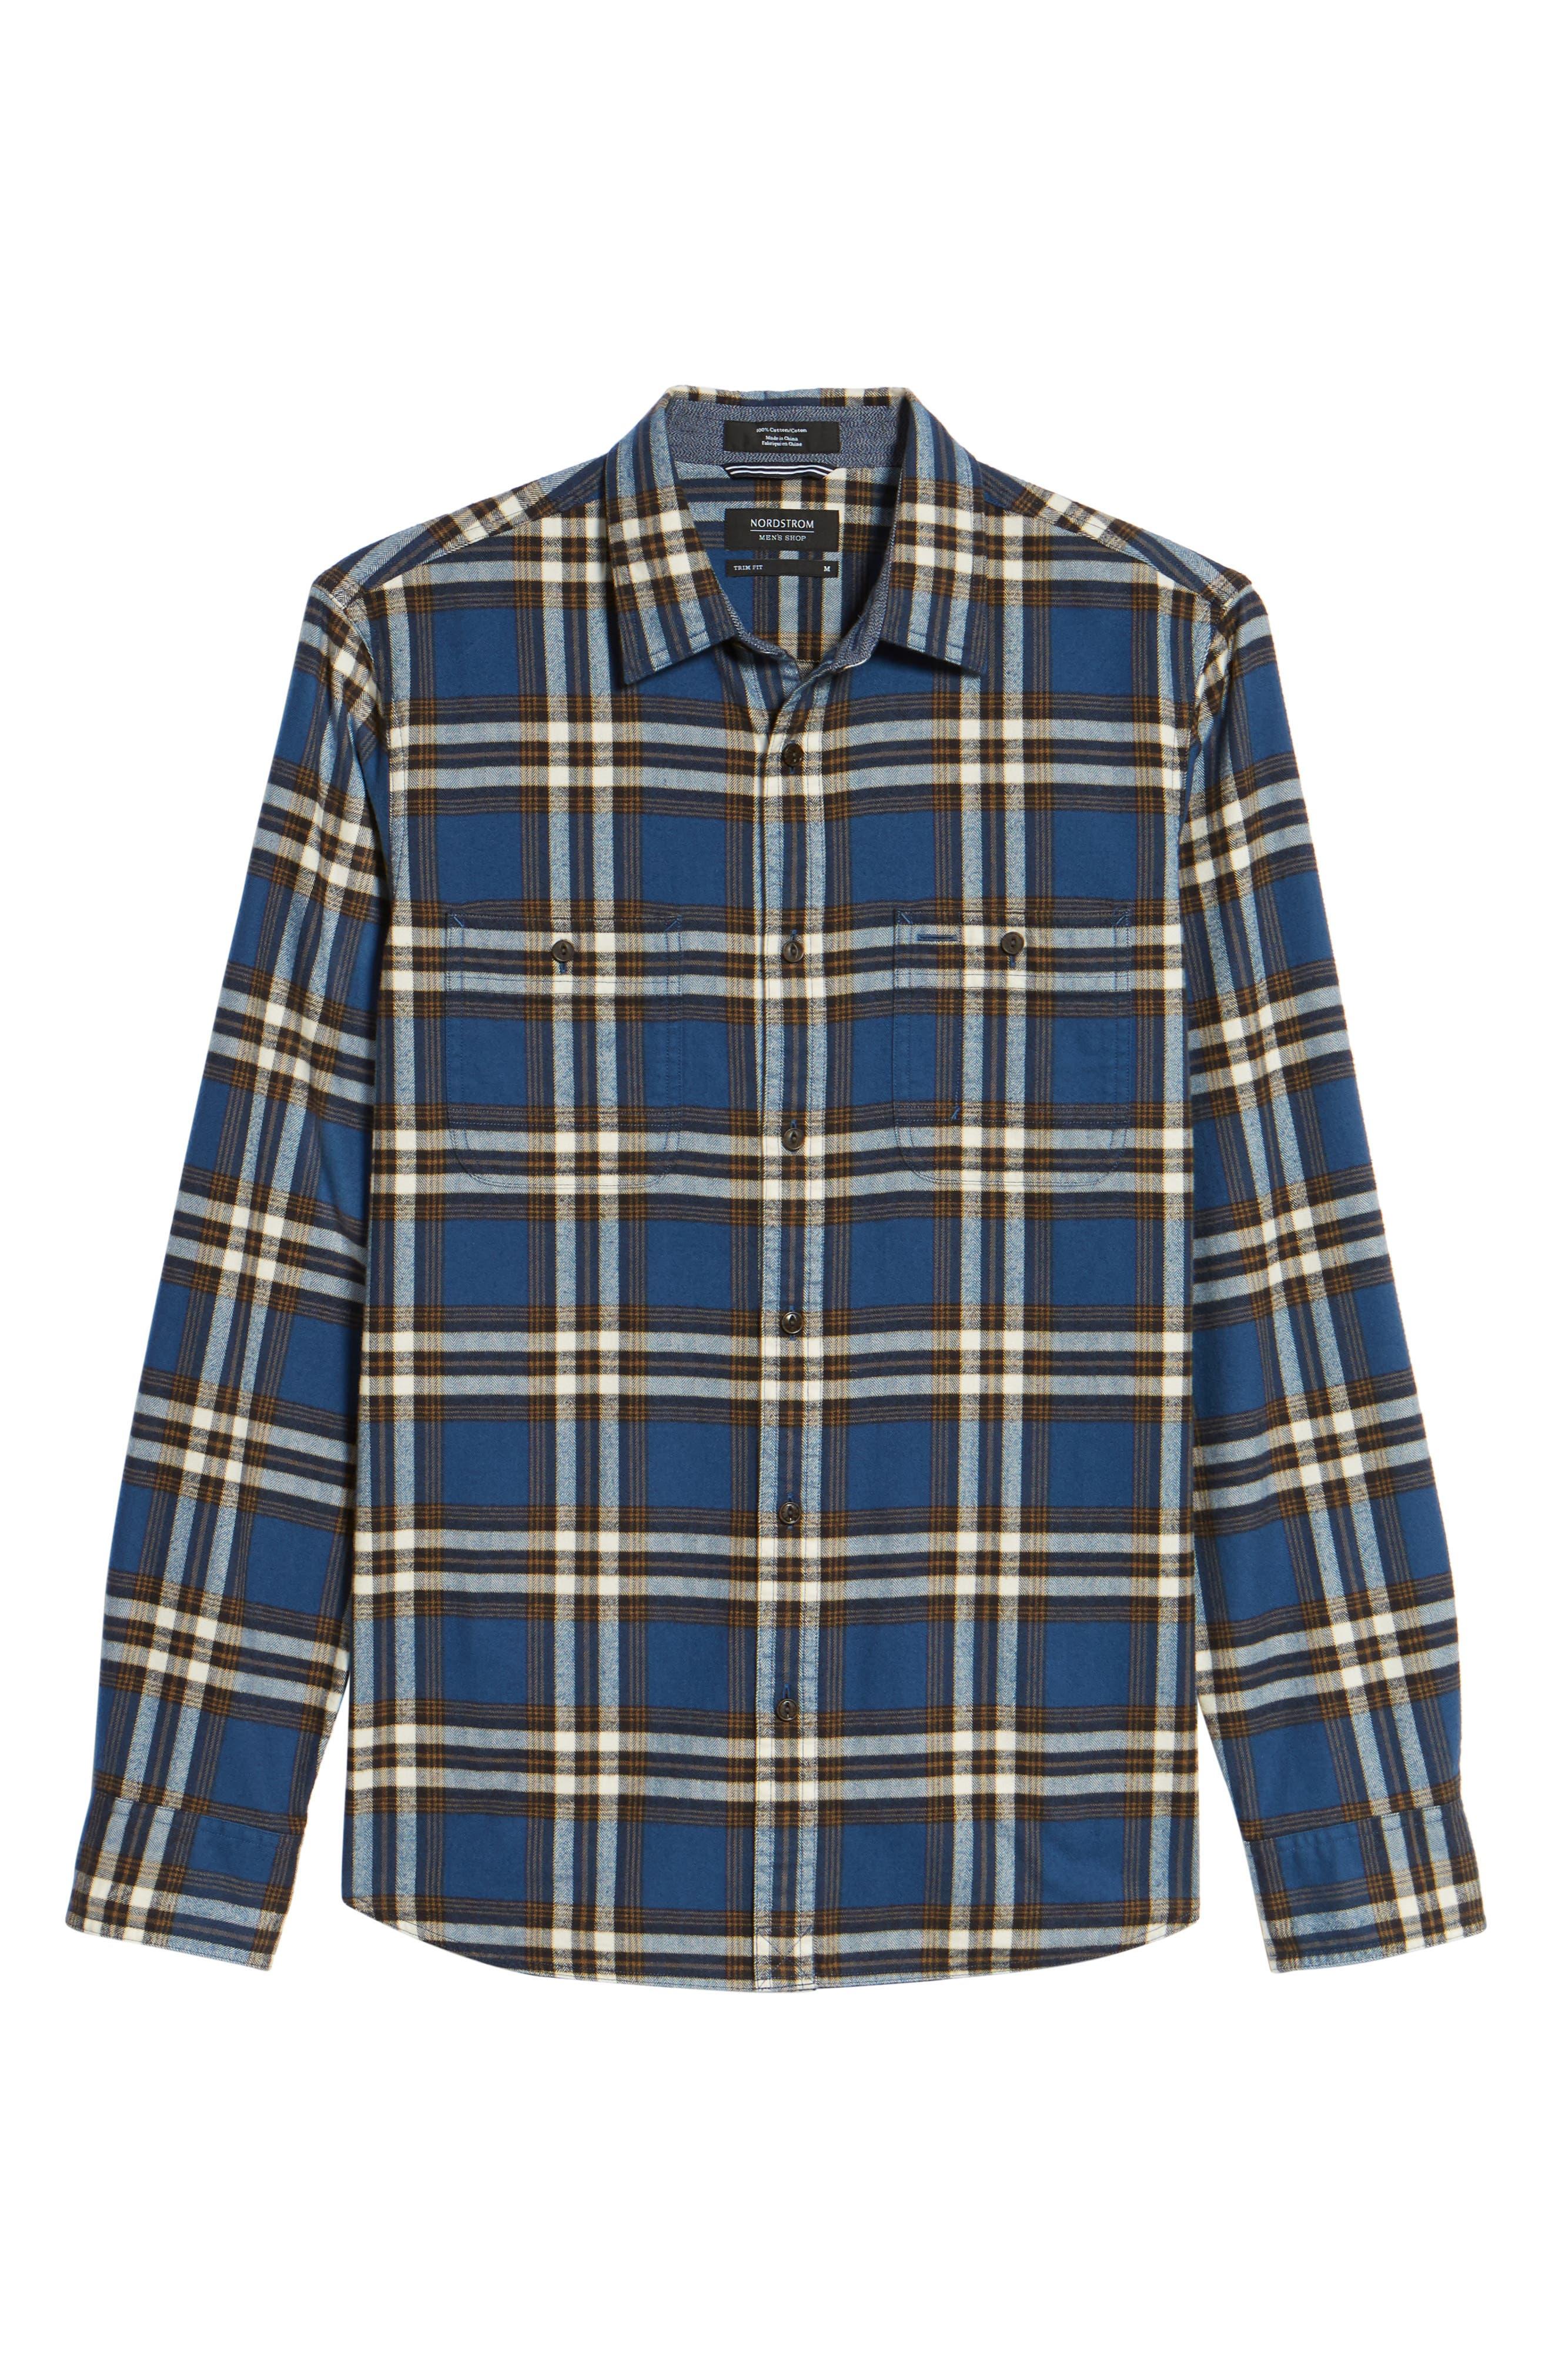 Trim Fit Workwear Check Flannel Shirt,                             Alternate thumbnail 6, color,                             Blue Vintage Brown Plaid